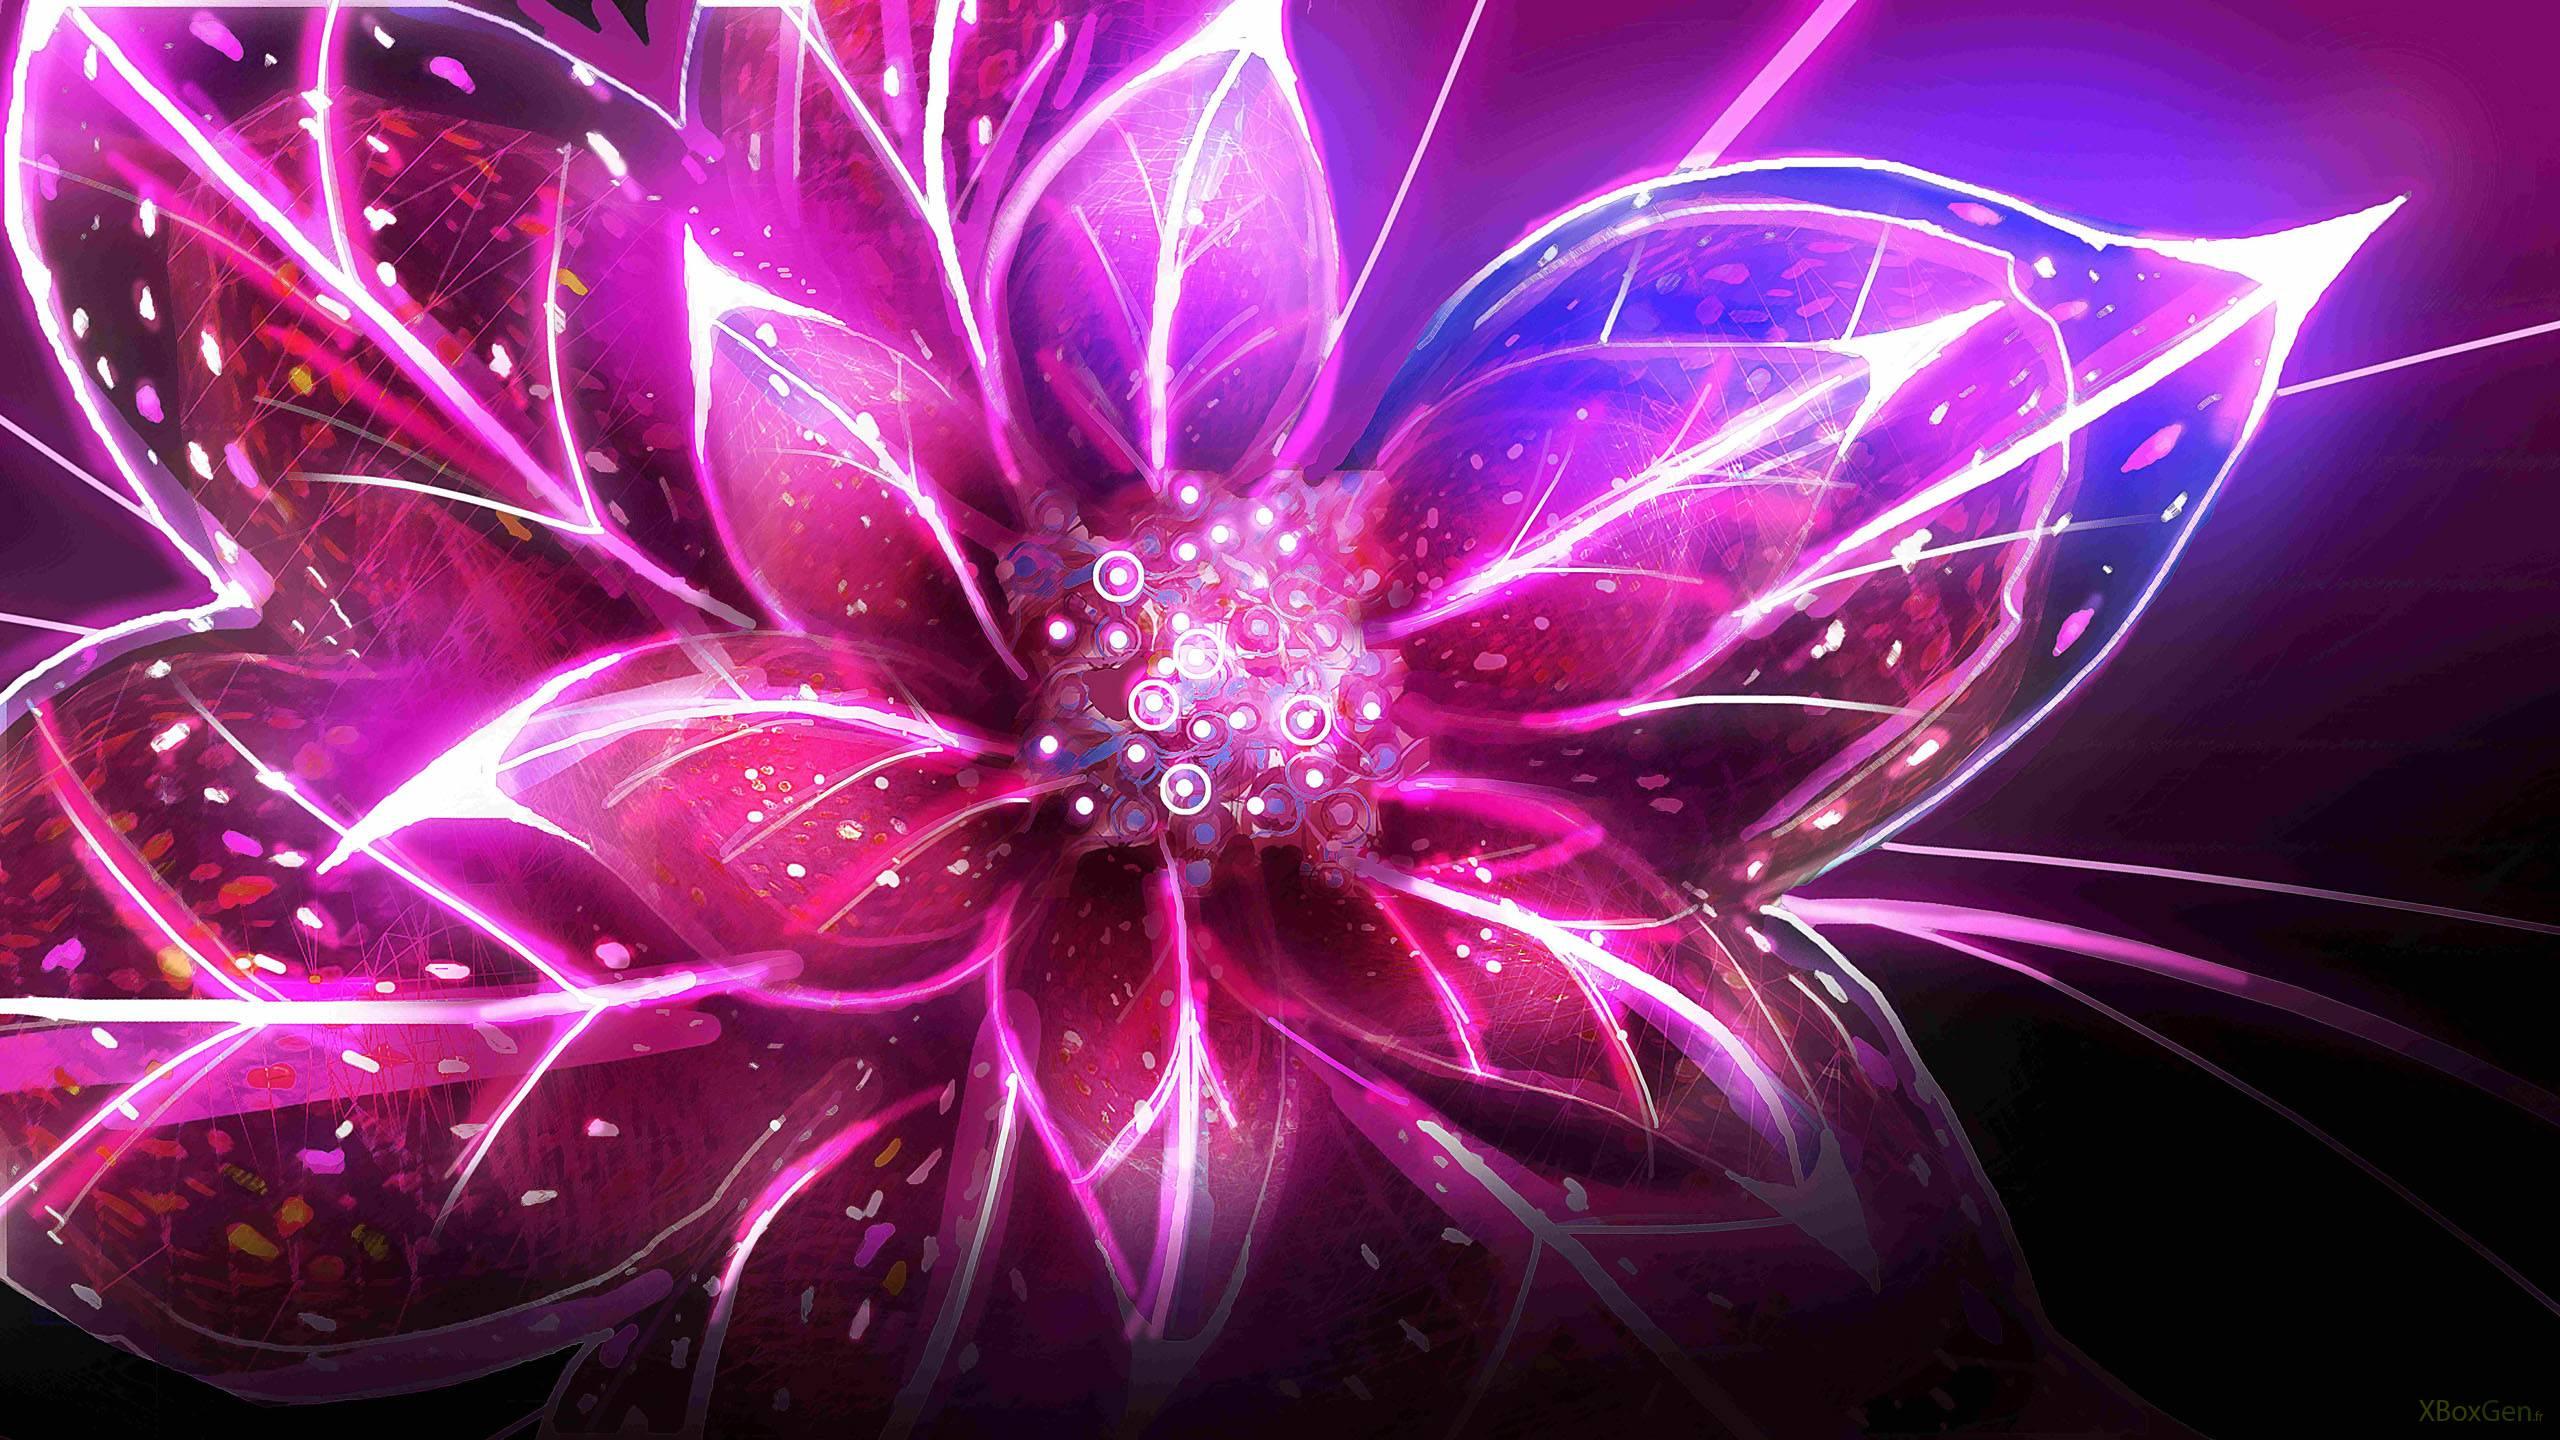 Flor fondo de pantalla hd fondo de escritorio for Bajar fondos de pantalla que se mueven